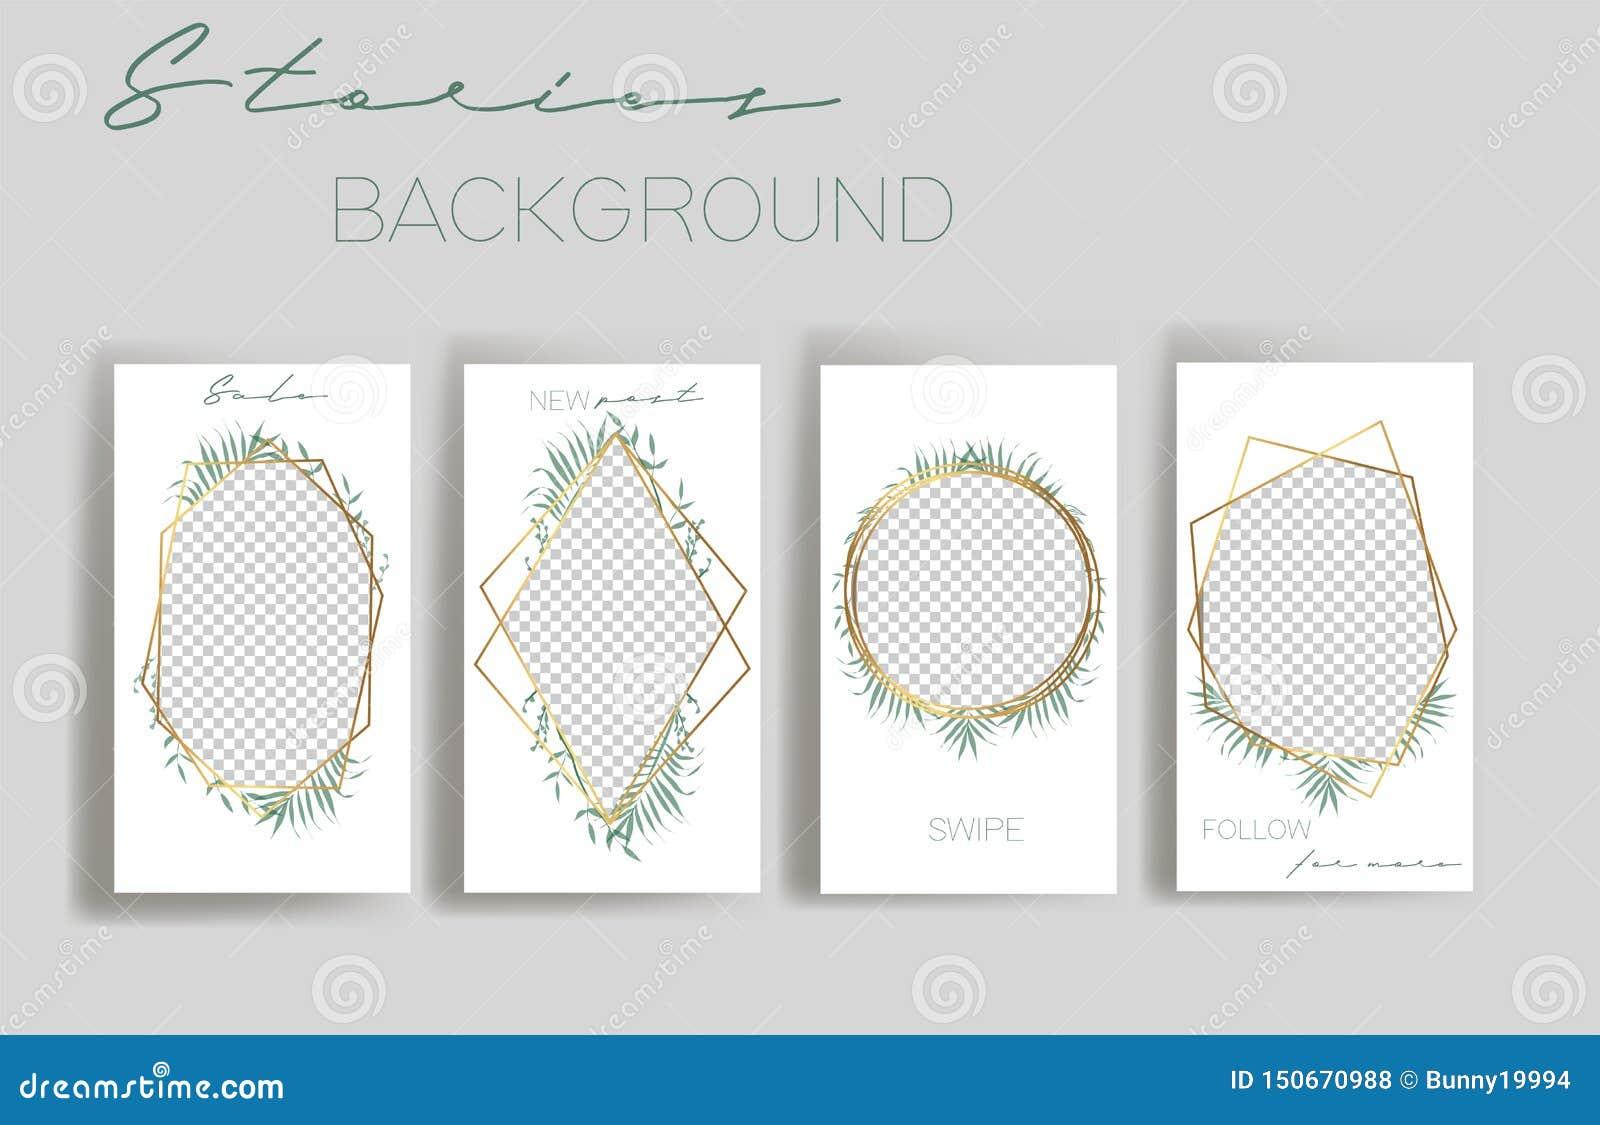 Design backgrounds for social media banner.Set of instagram stories frame templates.Vector cover.